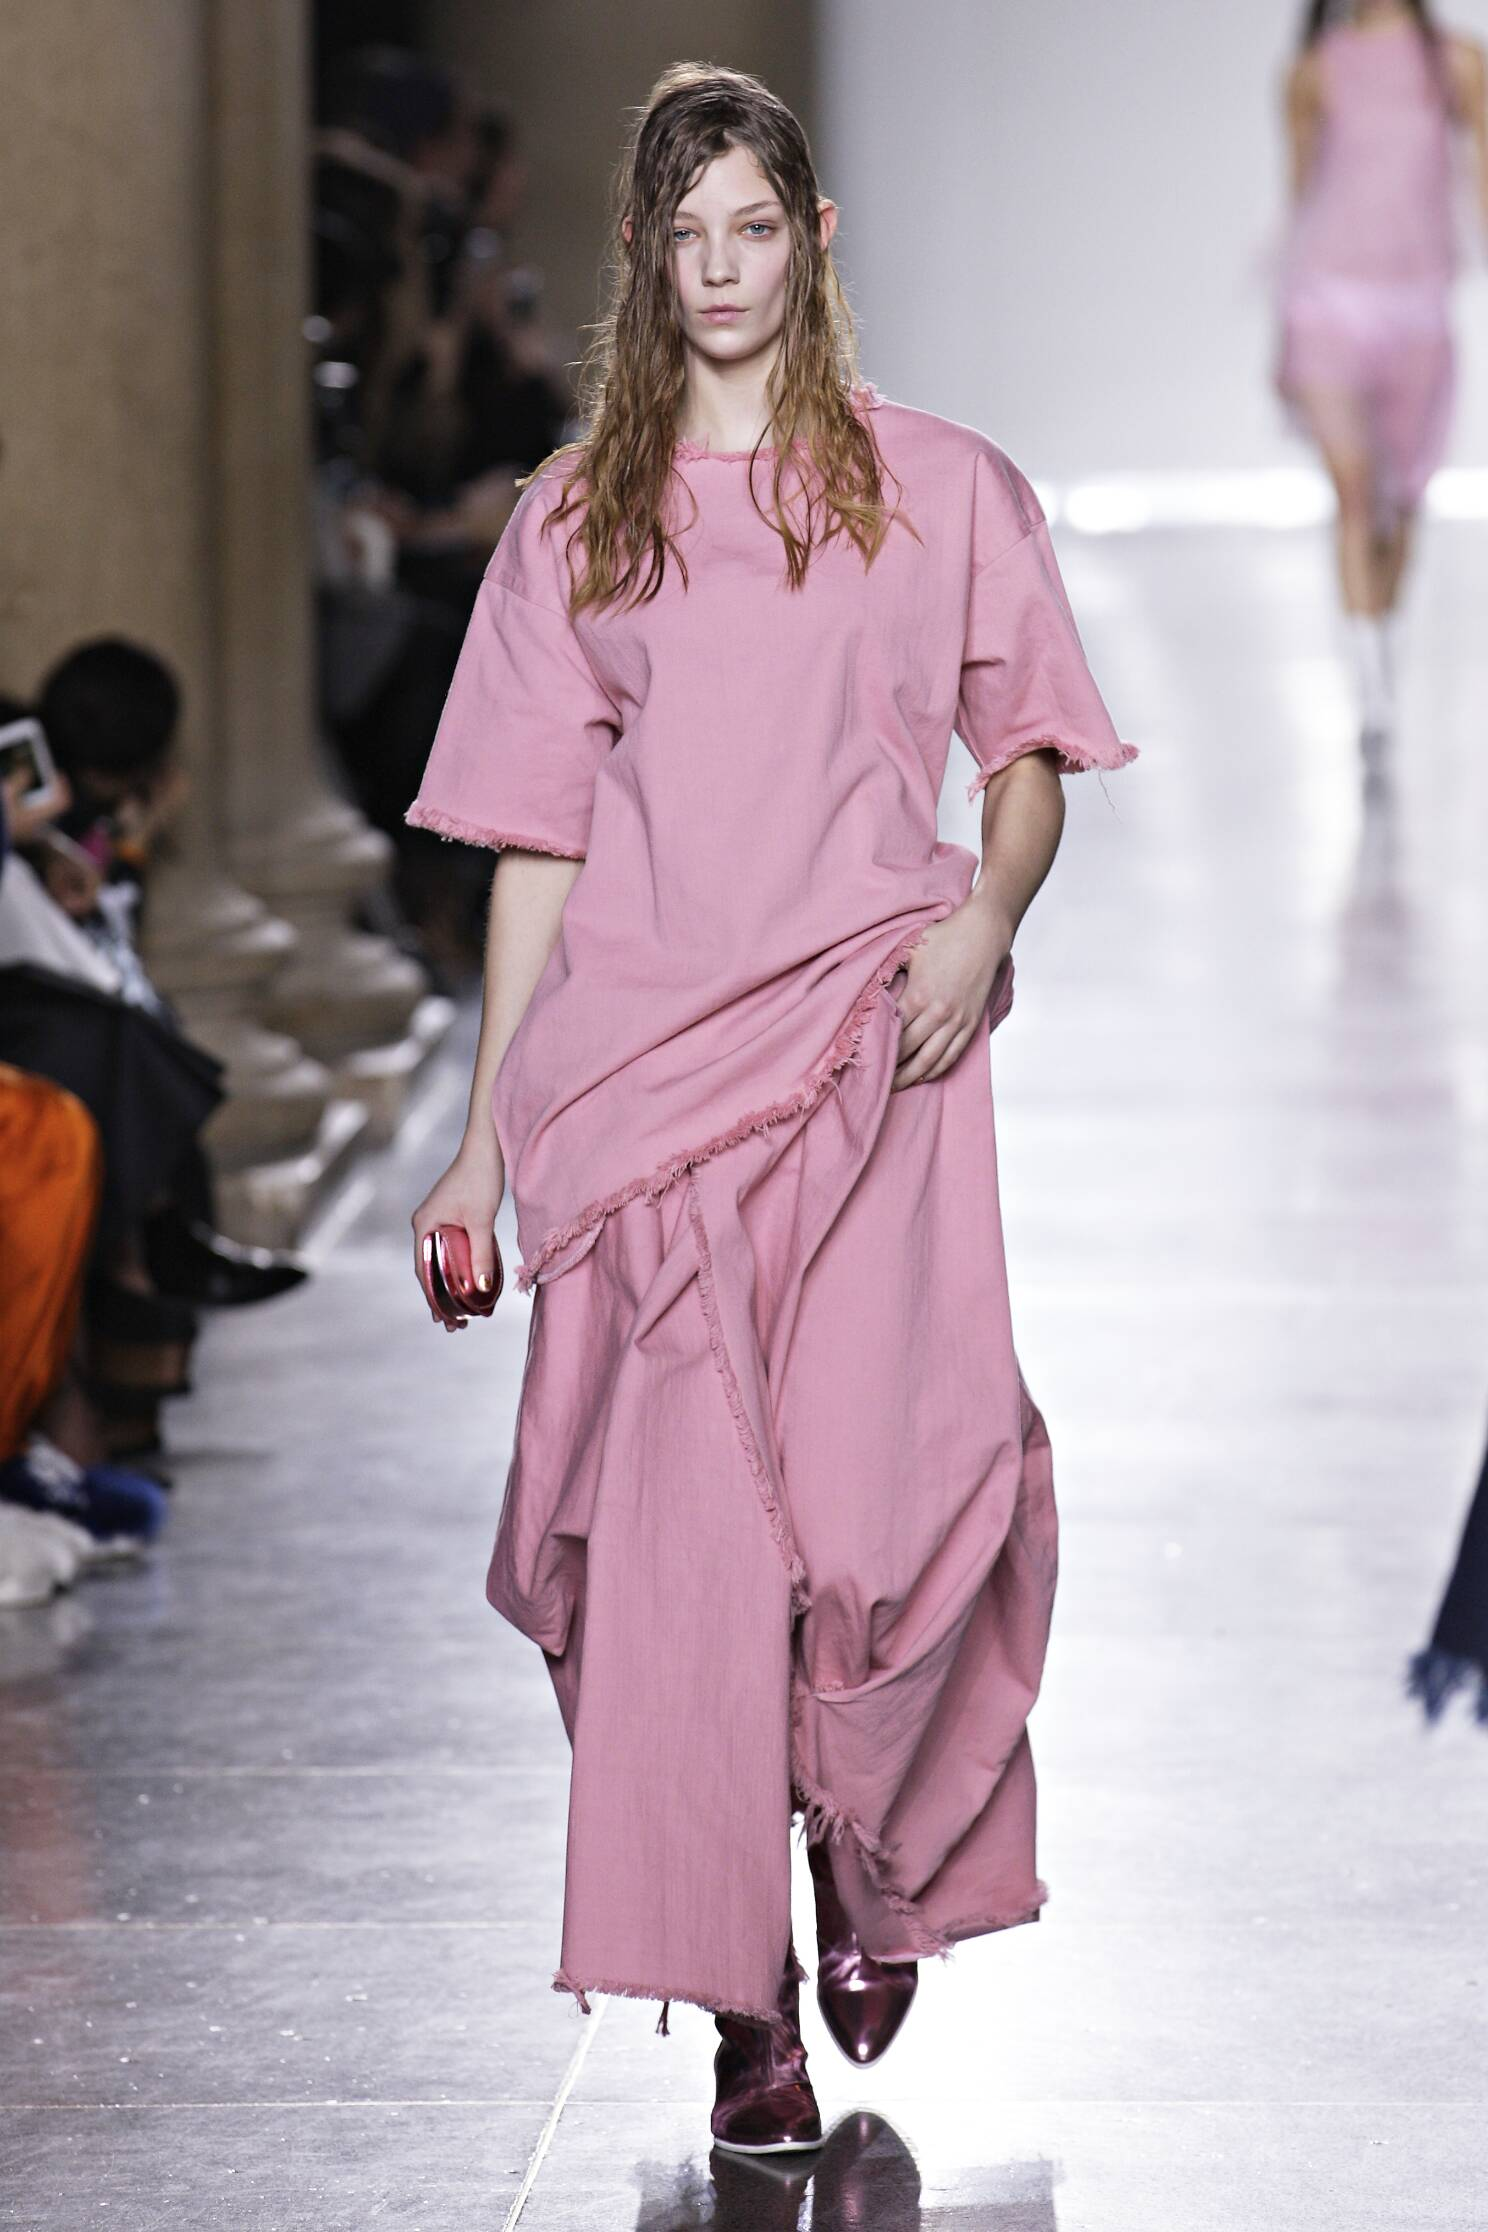 Marques Almeida Fall Winter 2015 16 Womenswear Collection London Fashion Week Fashion Show